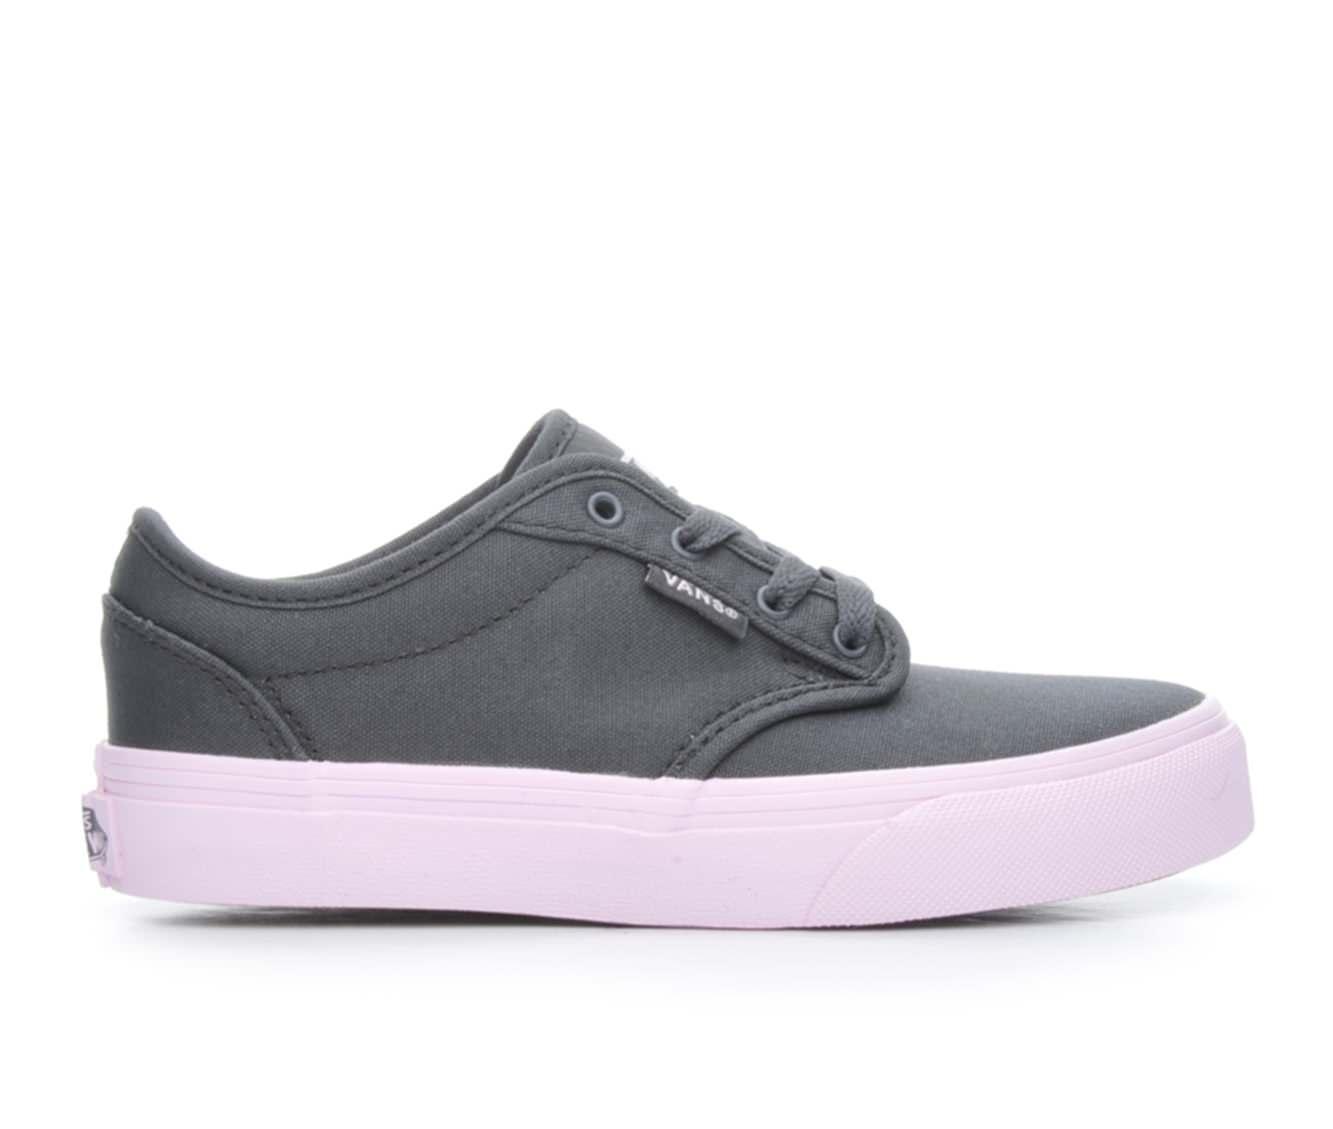 Girls' Vans Atwood G Skate Shoes (Grey)